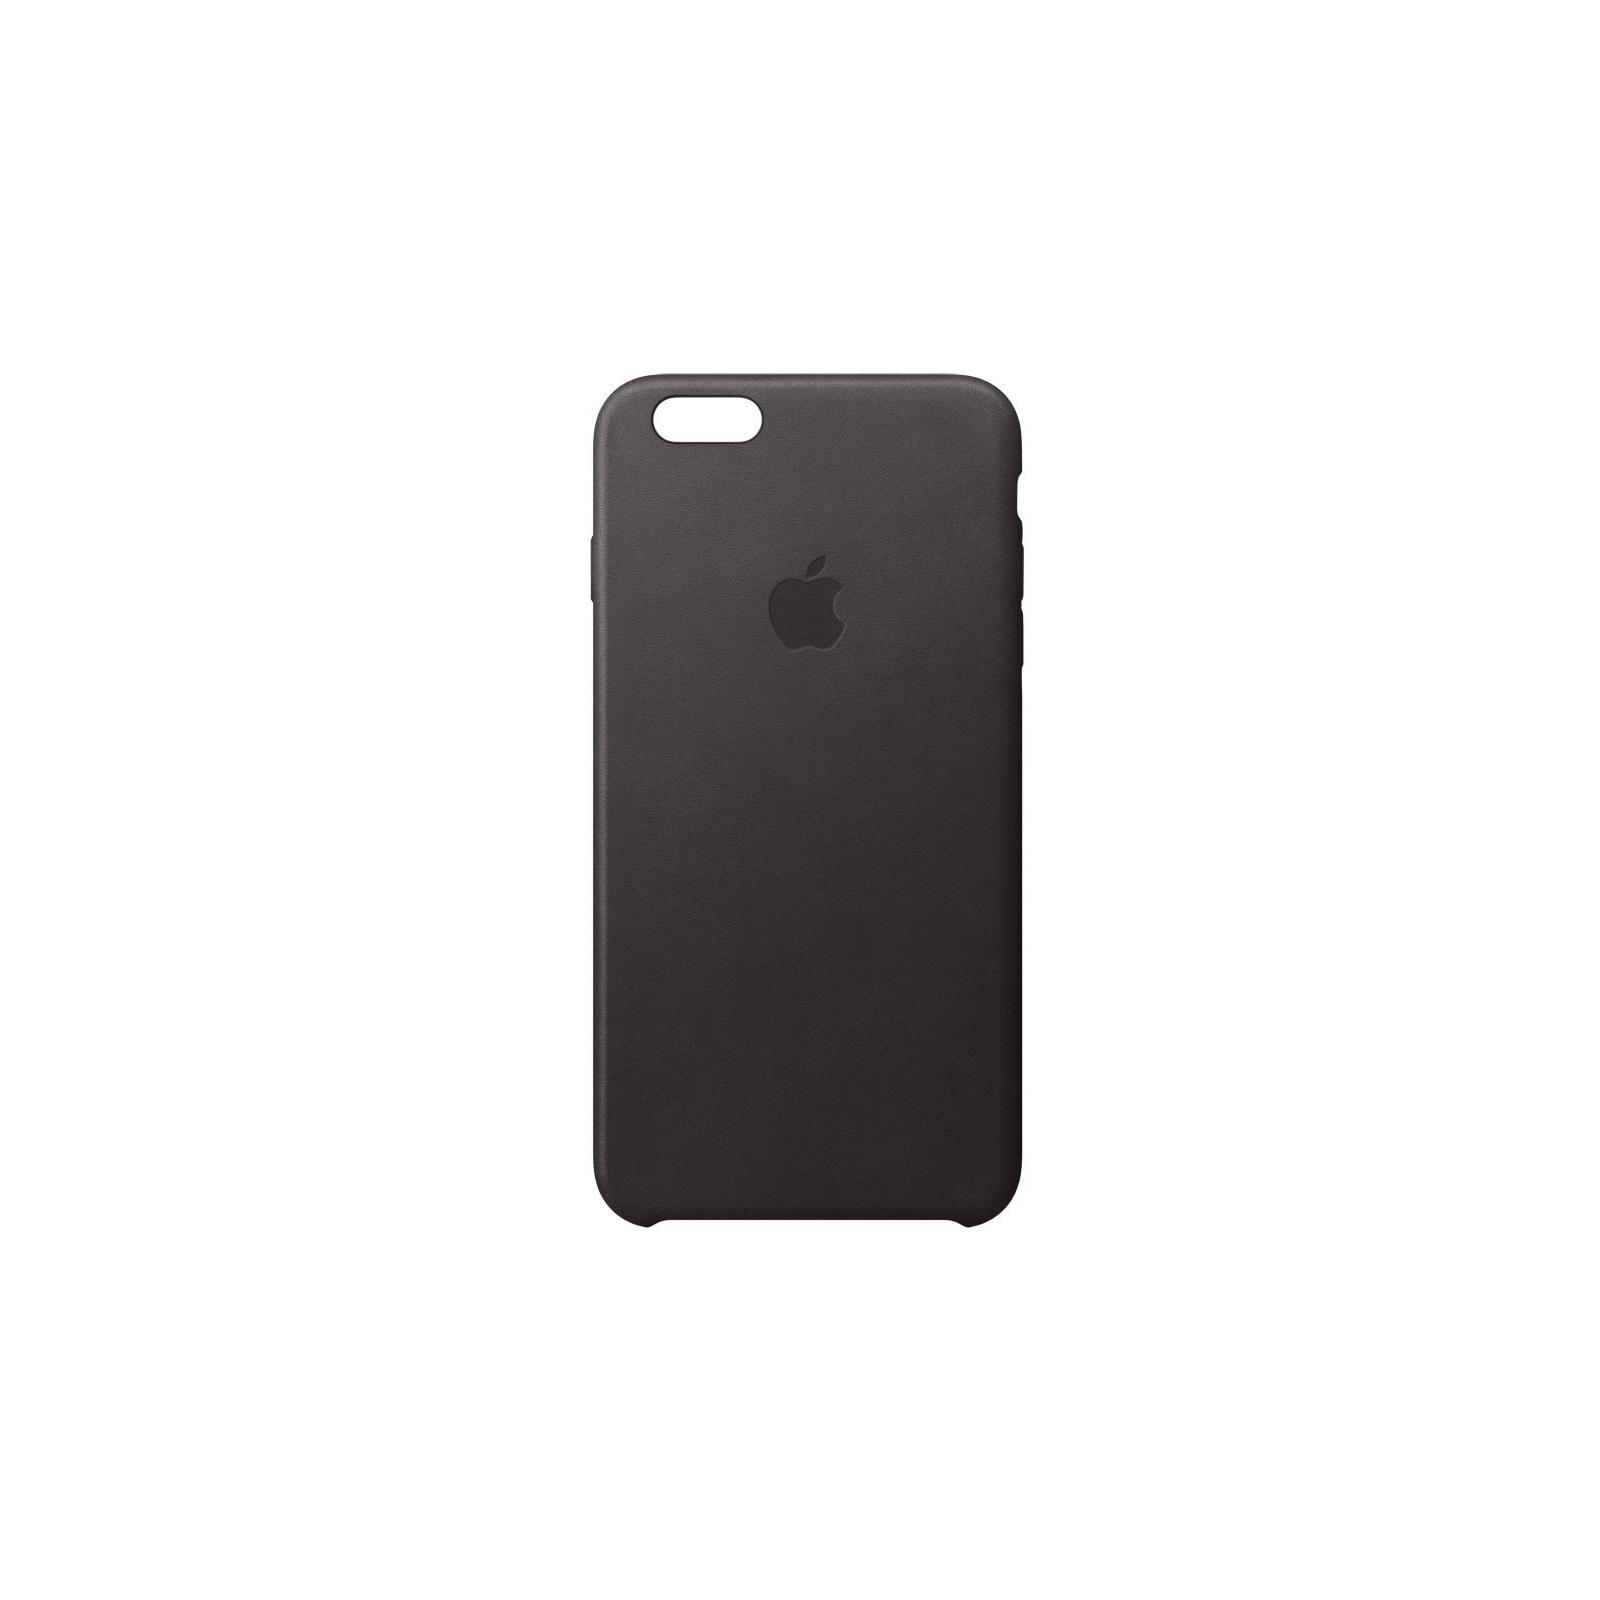 Чехол для моб. телефона Apple для iPhone 6/6s Black (MKXW2ZM/A)